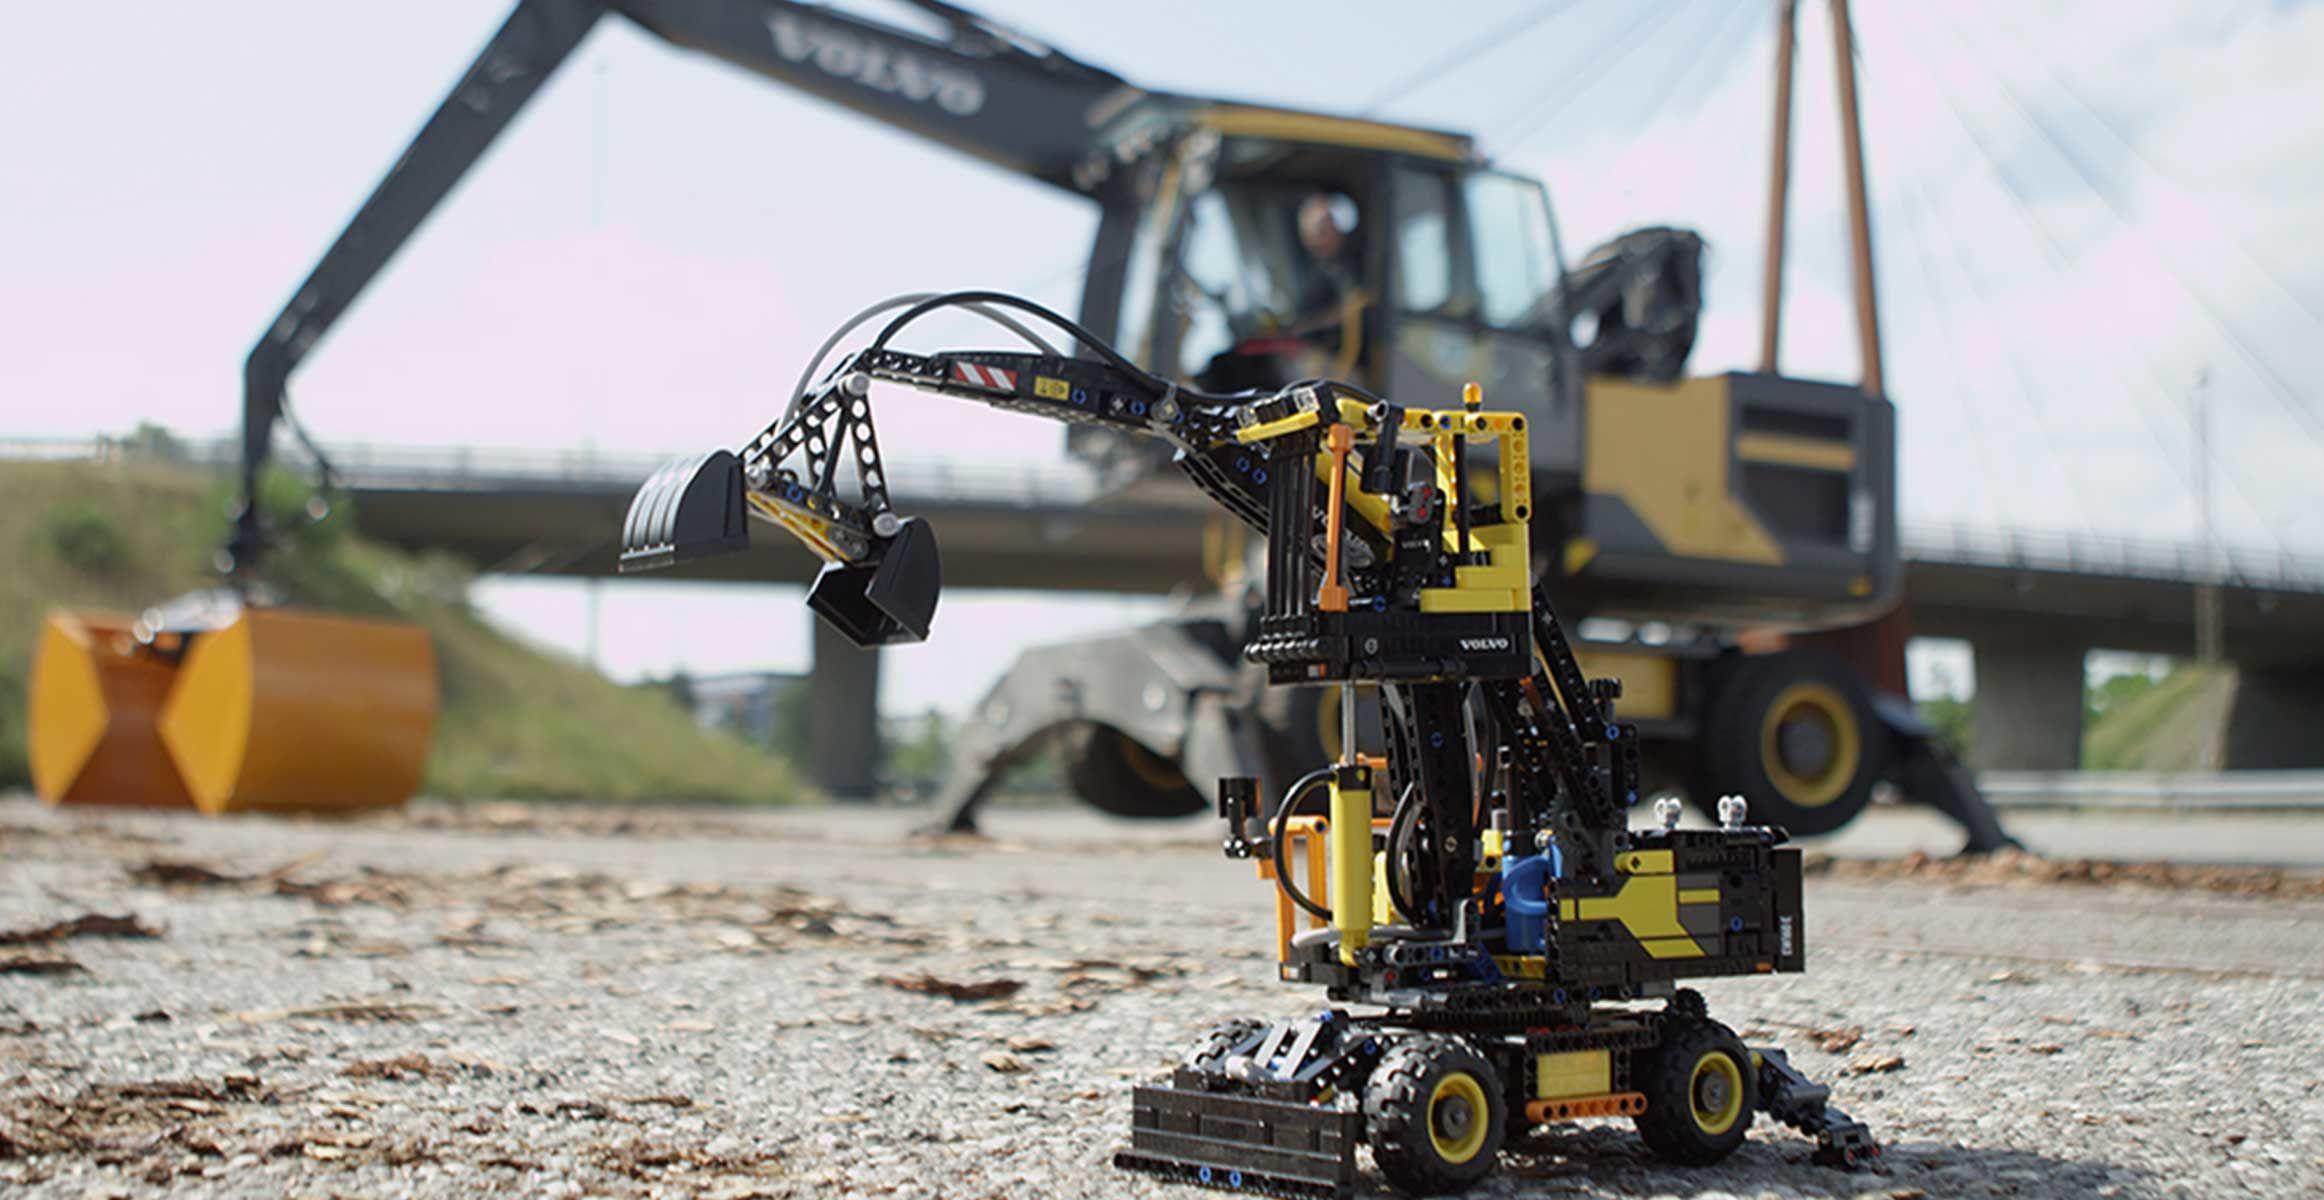 lego technic builds air powered mini wheeled excavator. Black Bedroom Furniture Sets. Home Design Ideas